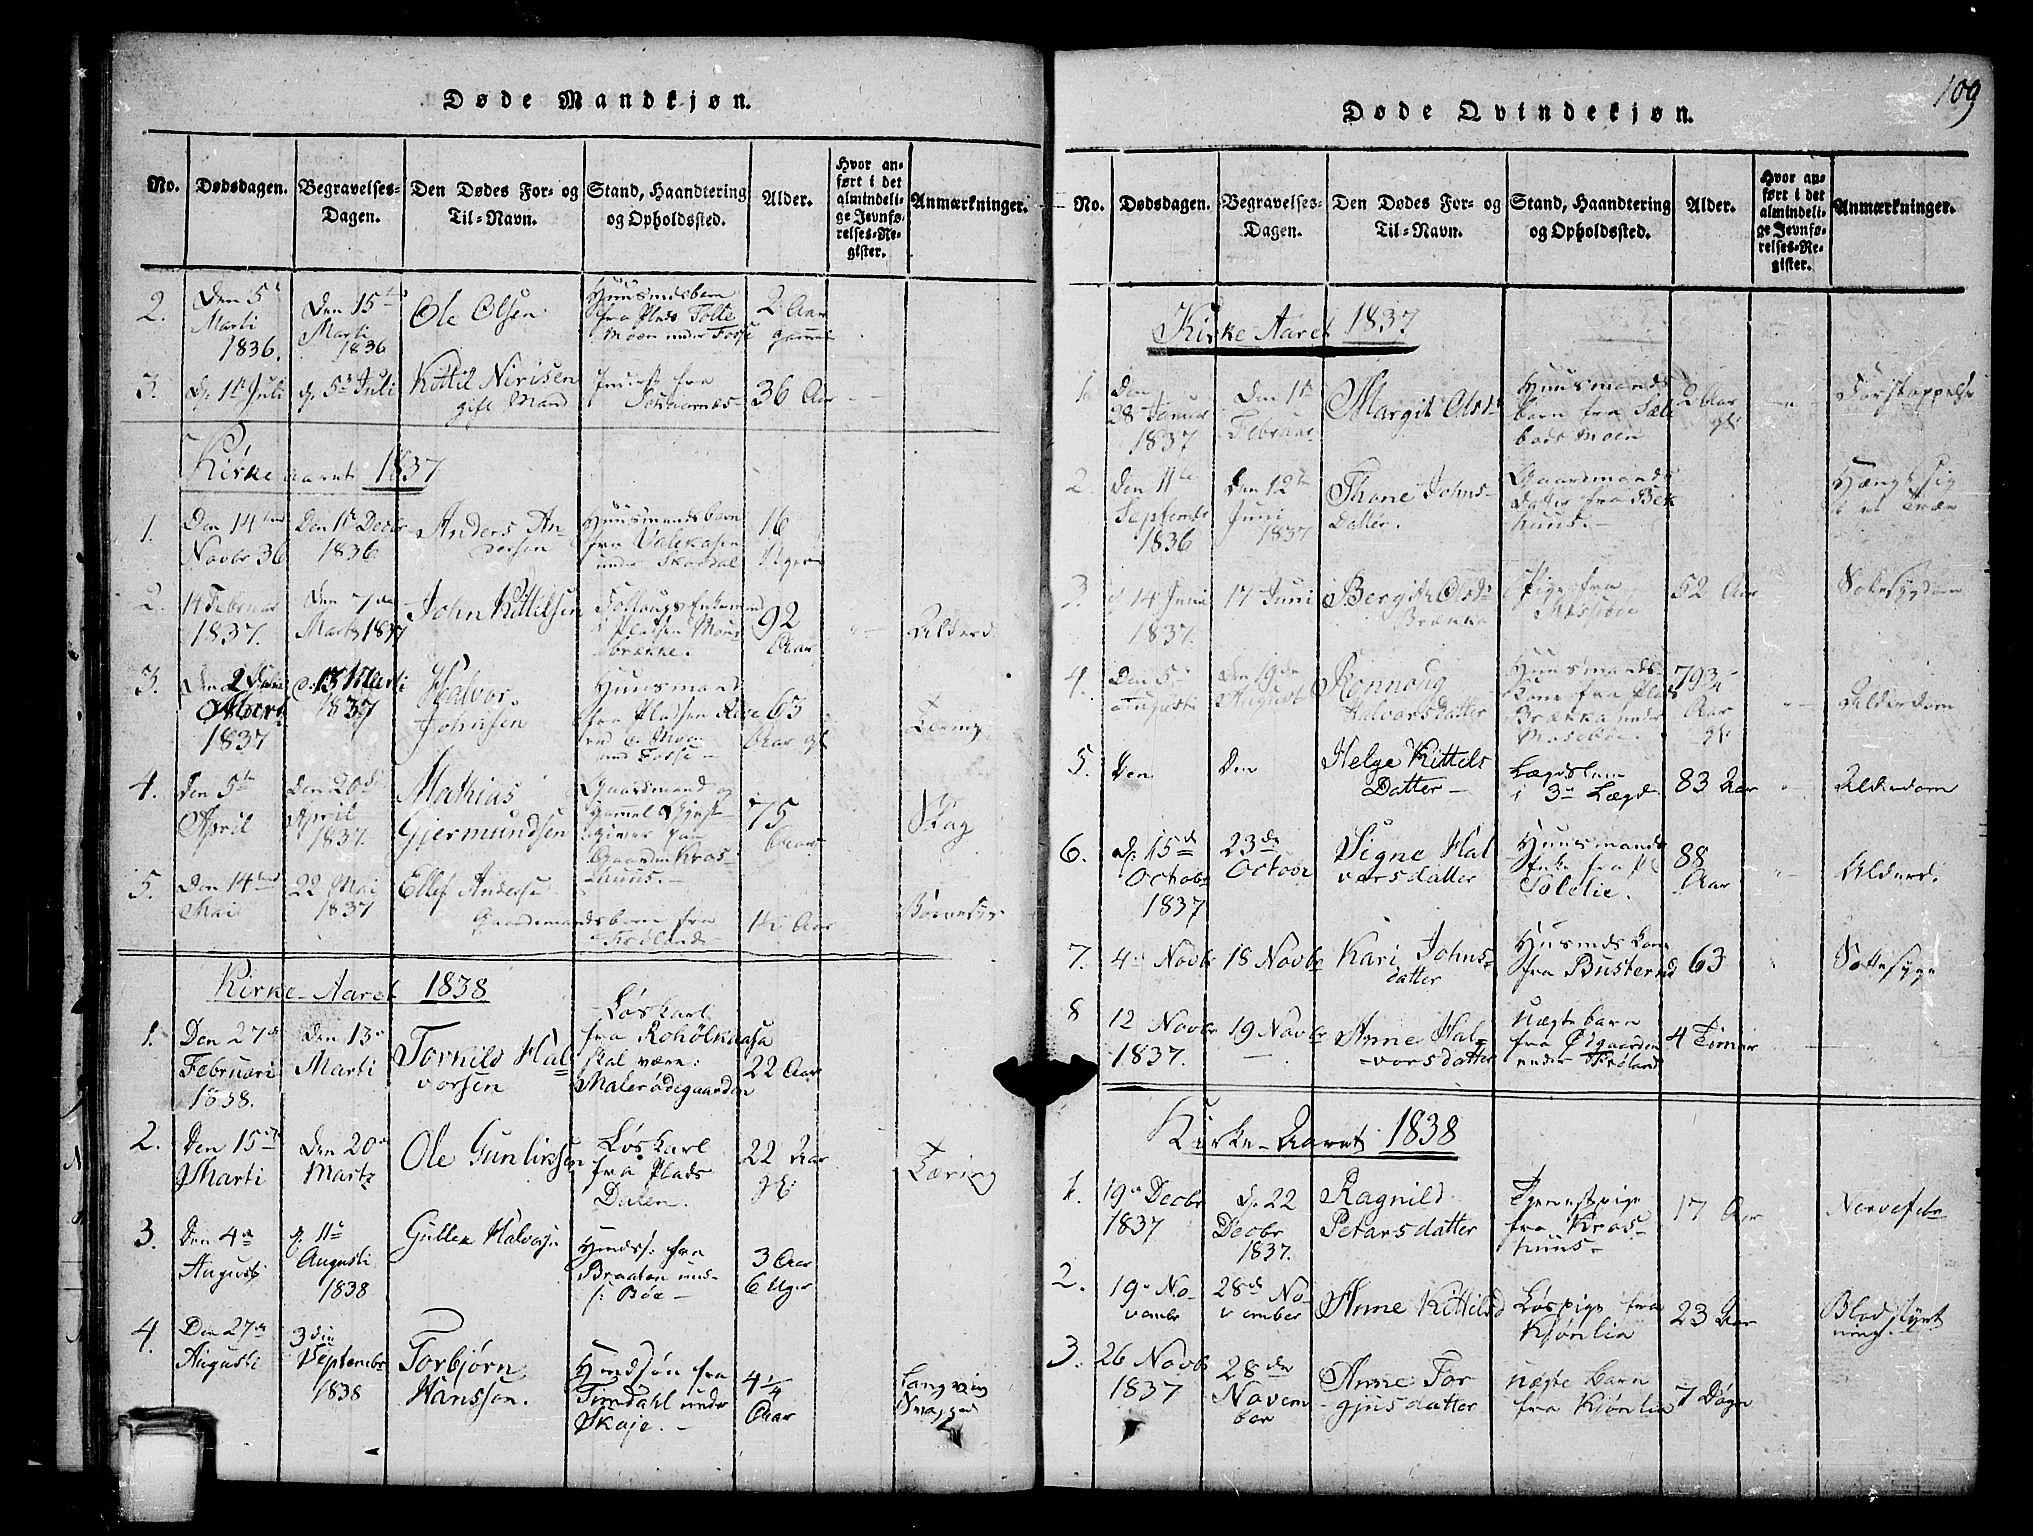 SAKO, Hjartdal kirkebøker, G/Gb/L0001: Klokkerbok nr. II 1, 1815-1842, s. 109